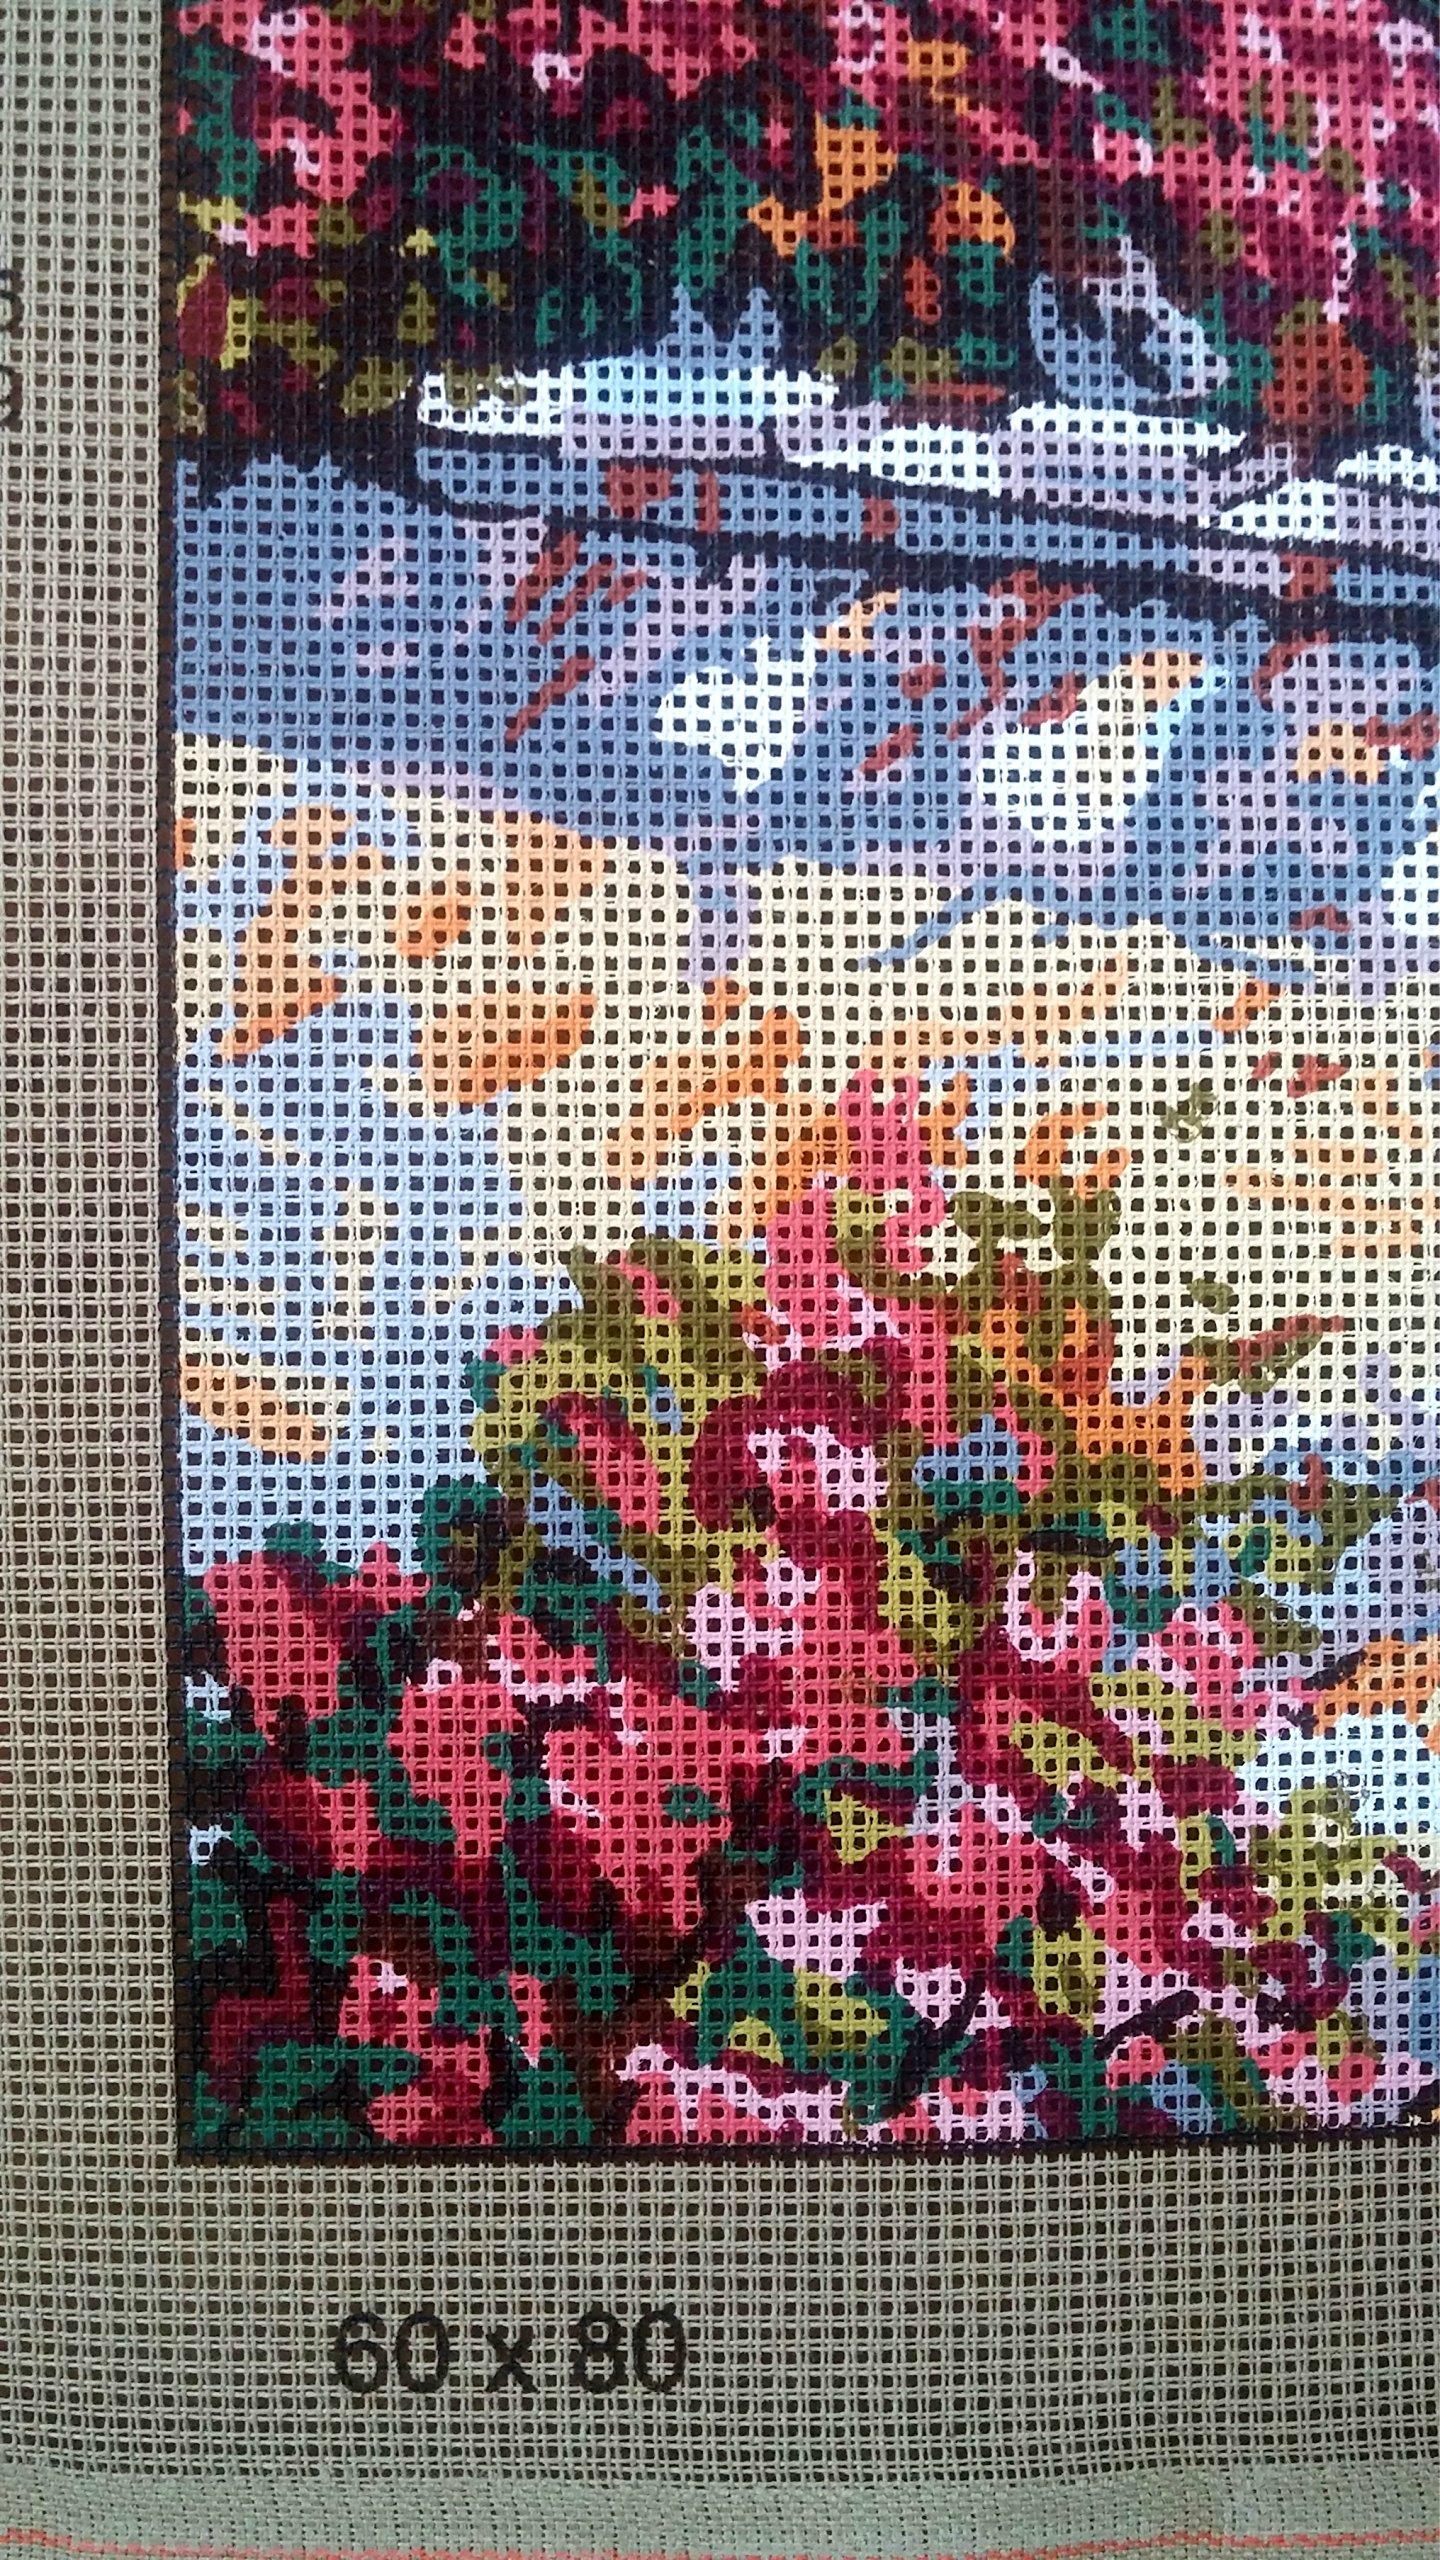 hudemas Needlepoint Kit The Church 15.7x11.8 40x30cm Printed Canvas 222